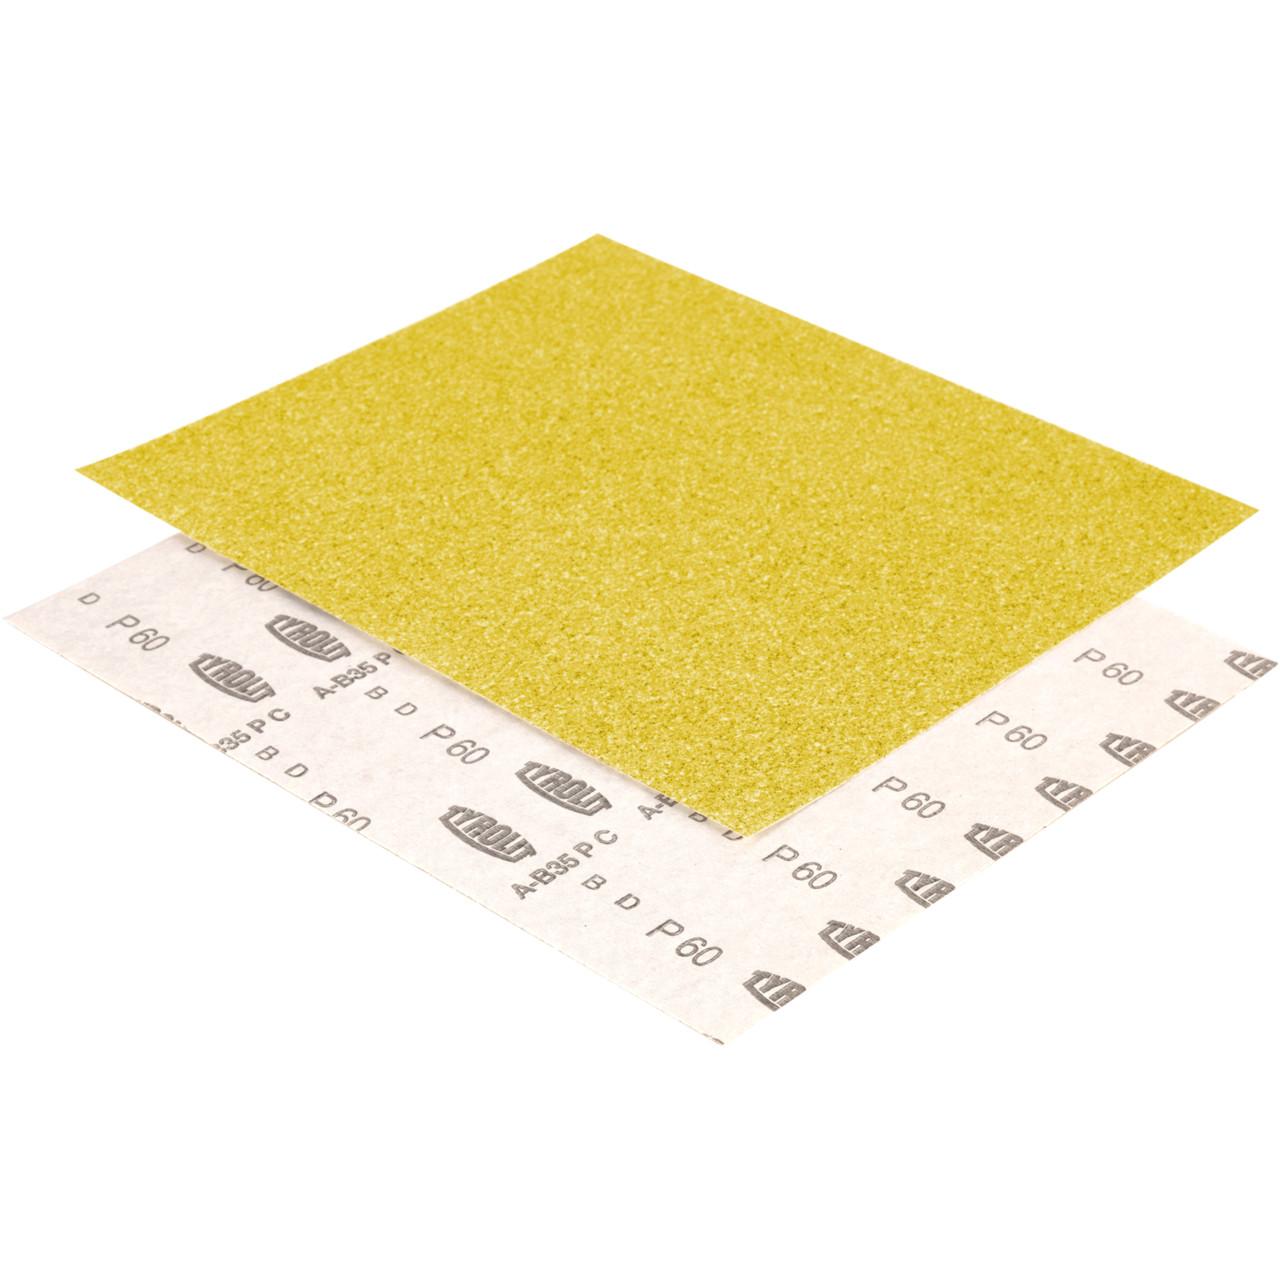 Immagine di Fogli di carta A-P21 P D PREMIUM*** per plastica, legno, pittura e vernice